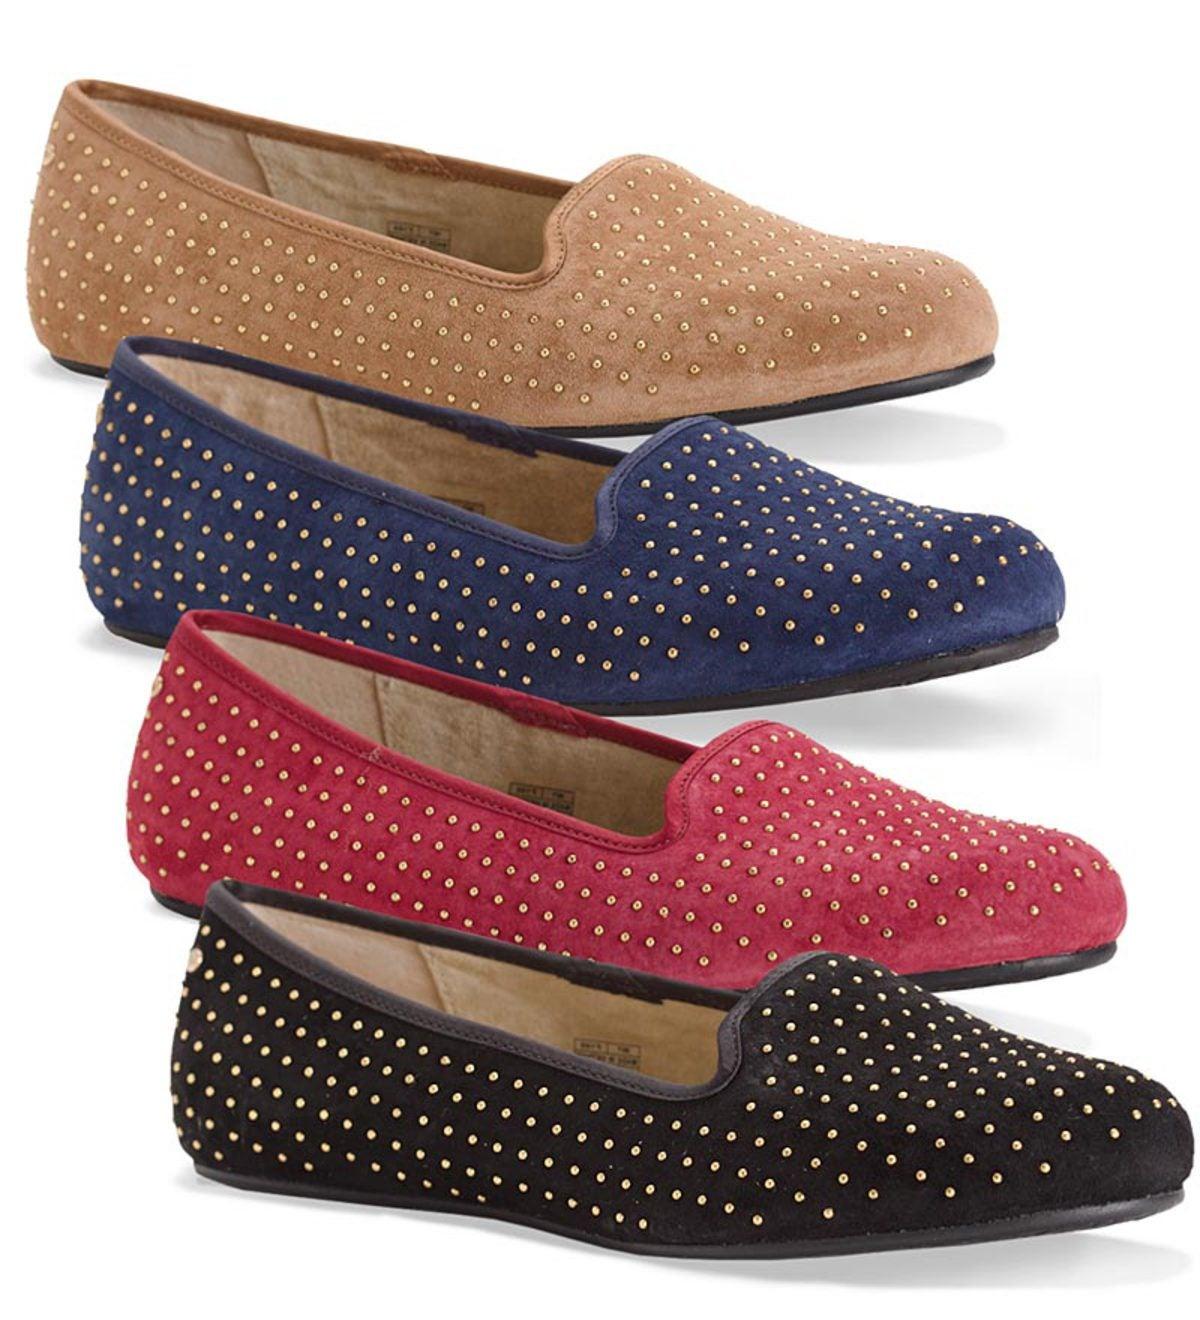 Ugg 174 Australia Women S Alloway Studded Flats Plowhearth